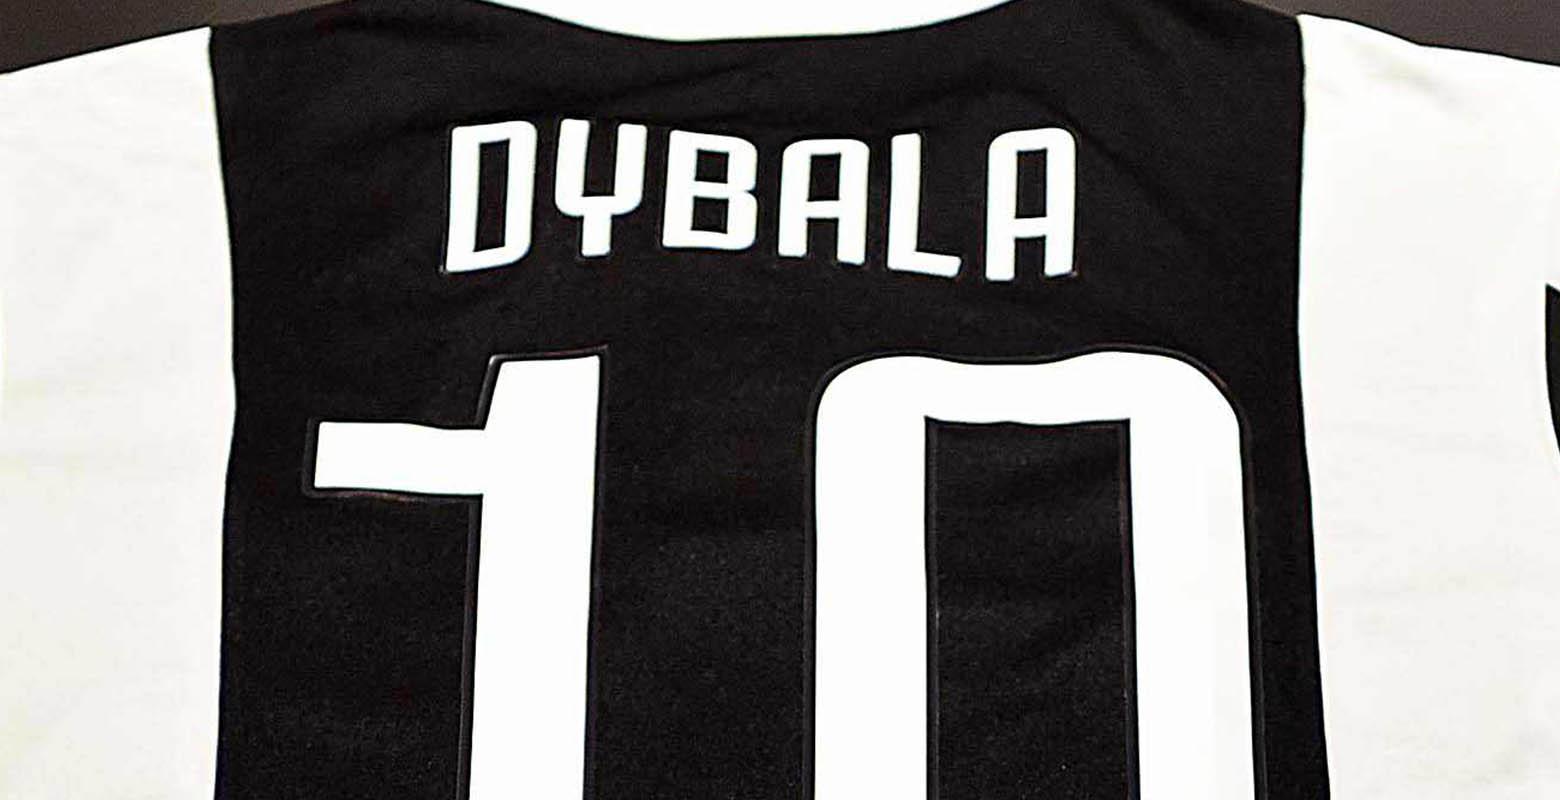 size 40 14845 65e20 Juventus Unveil New Dybala Shirt Number - Footy Headlines